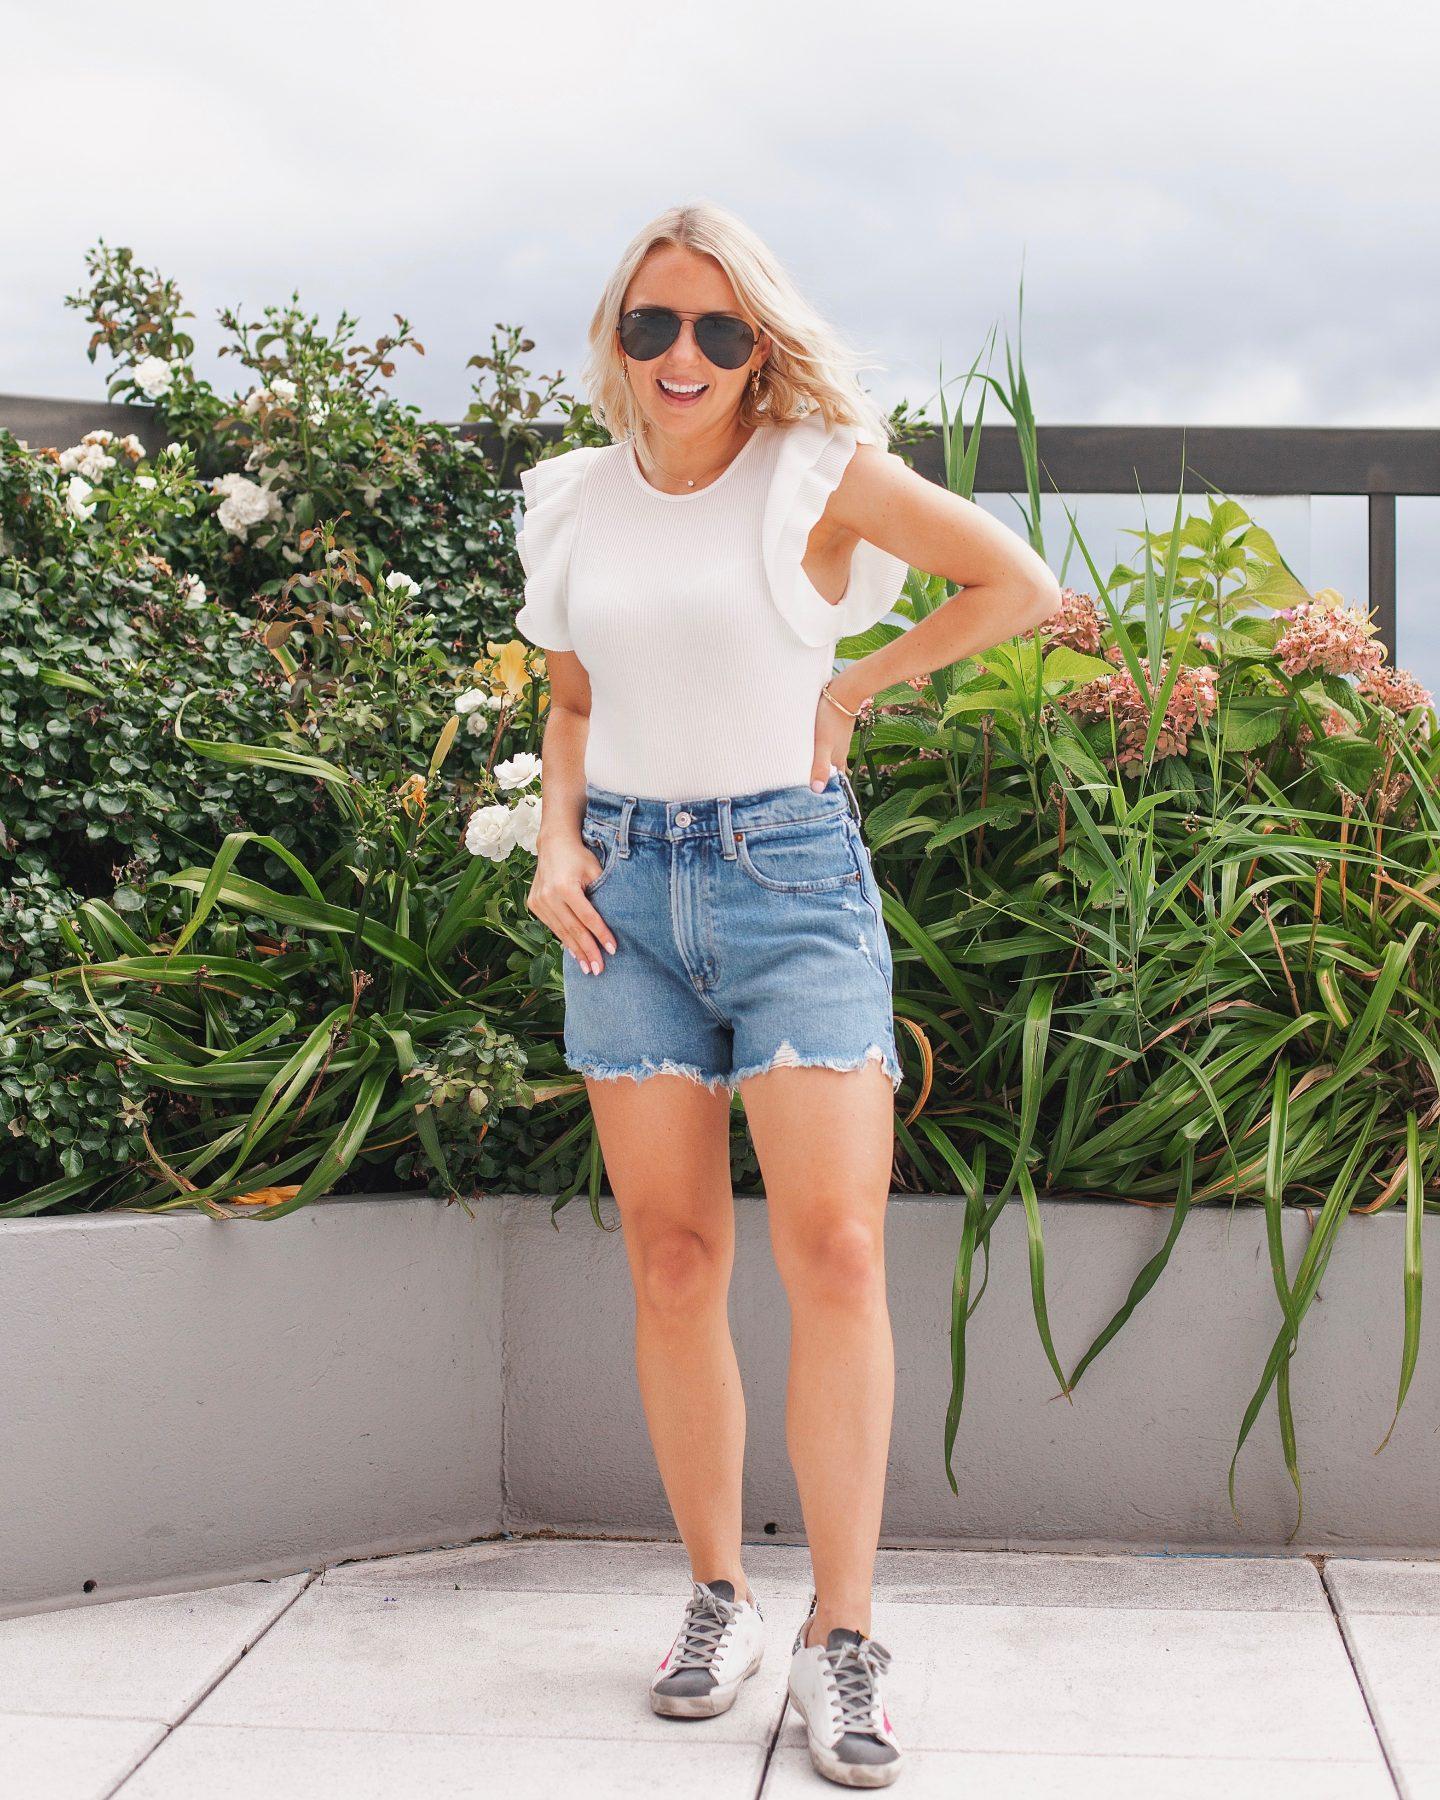 Abercrombie Jean Shorts vs Agolde Jean Shorts Review